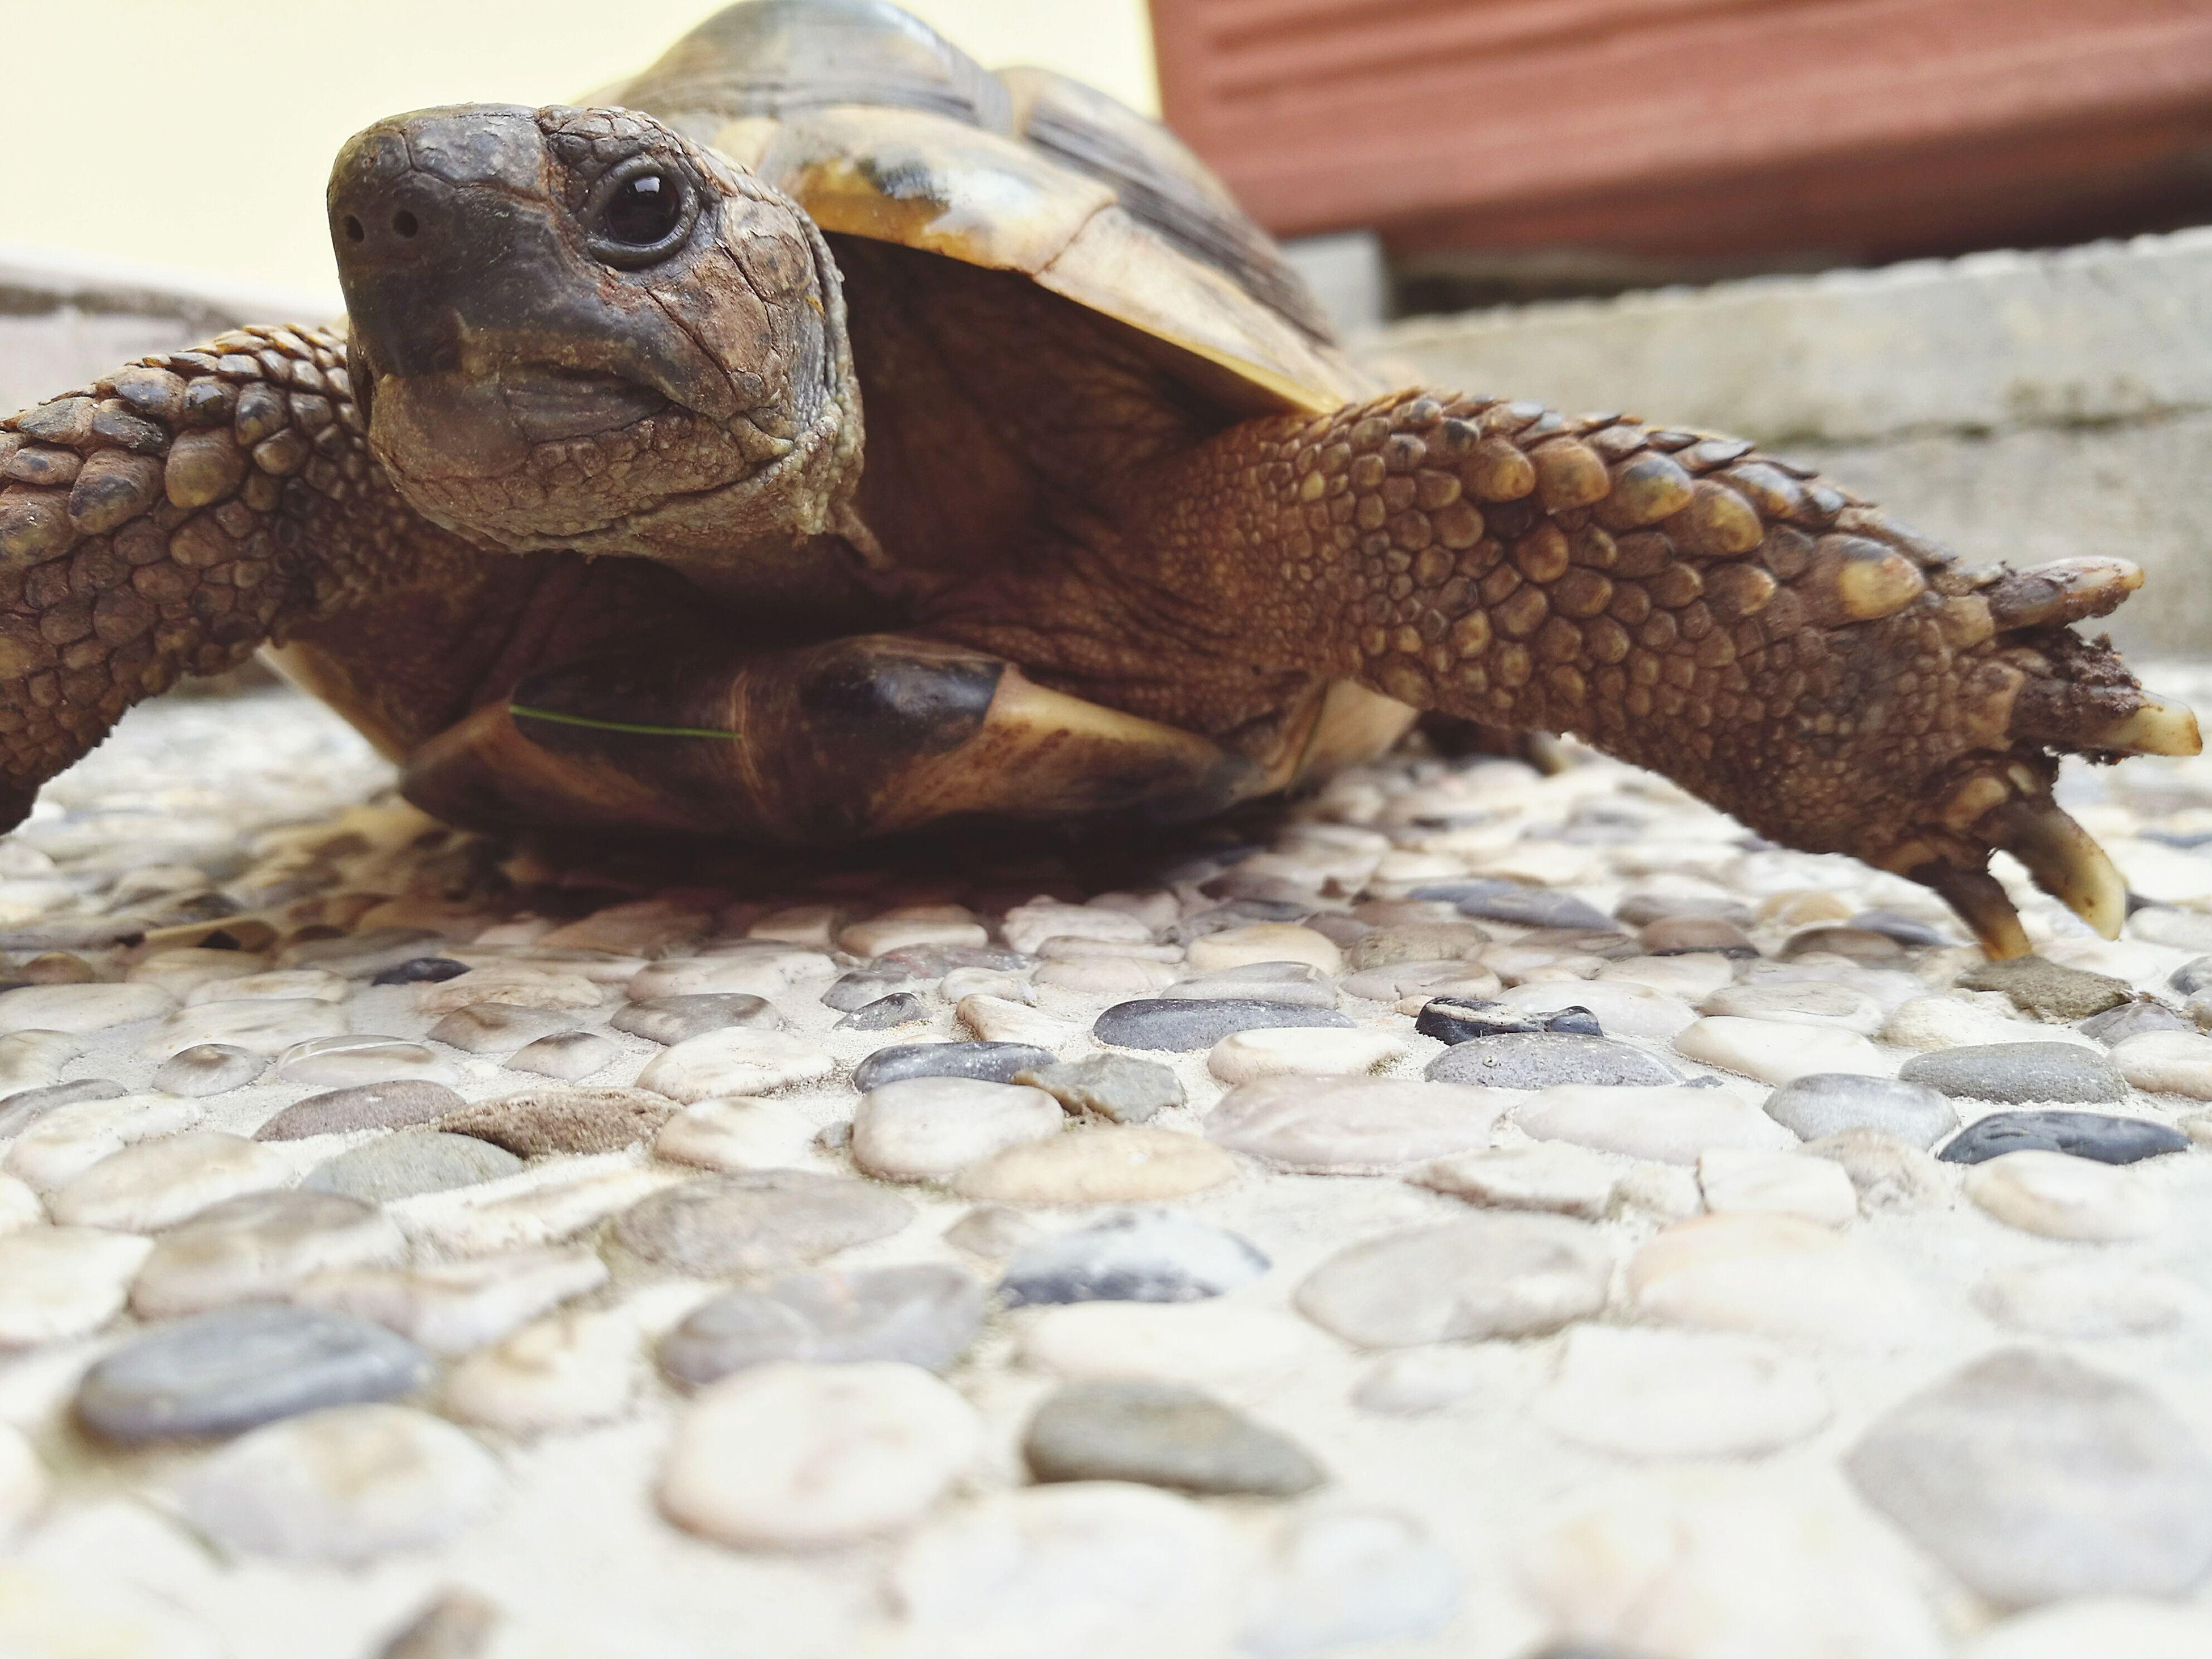 🐢🐢 Tartaruga Ninja Turtles Nature Nature Photography Granpa's Turtle photo by HuaweiP9